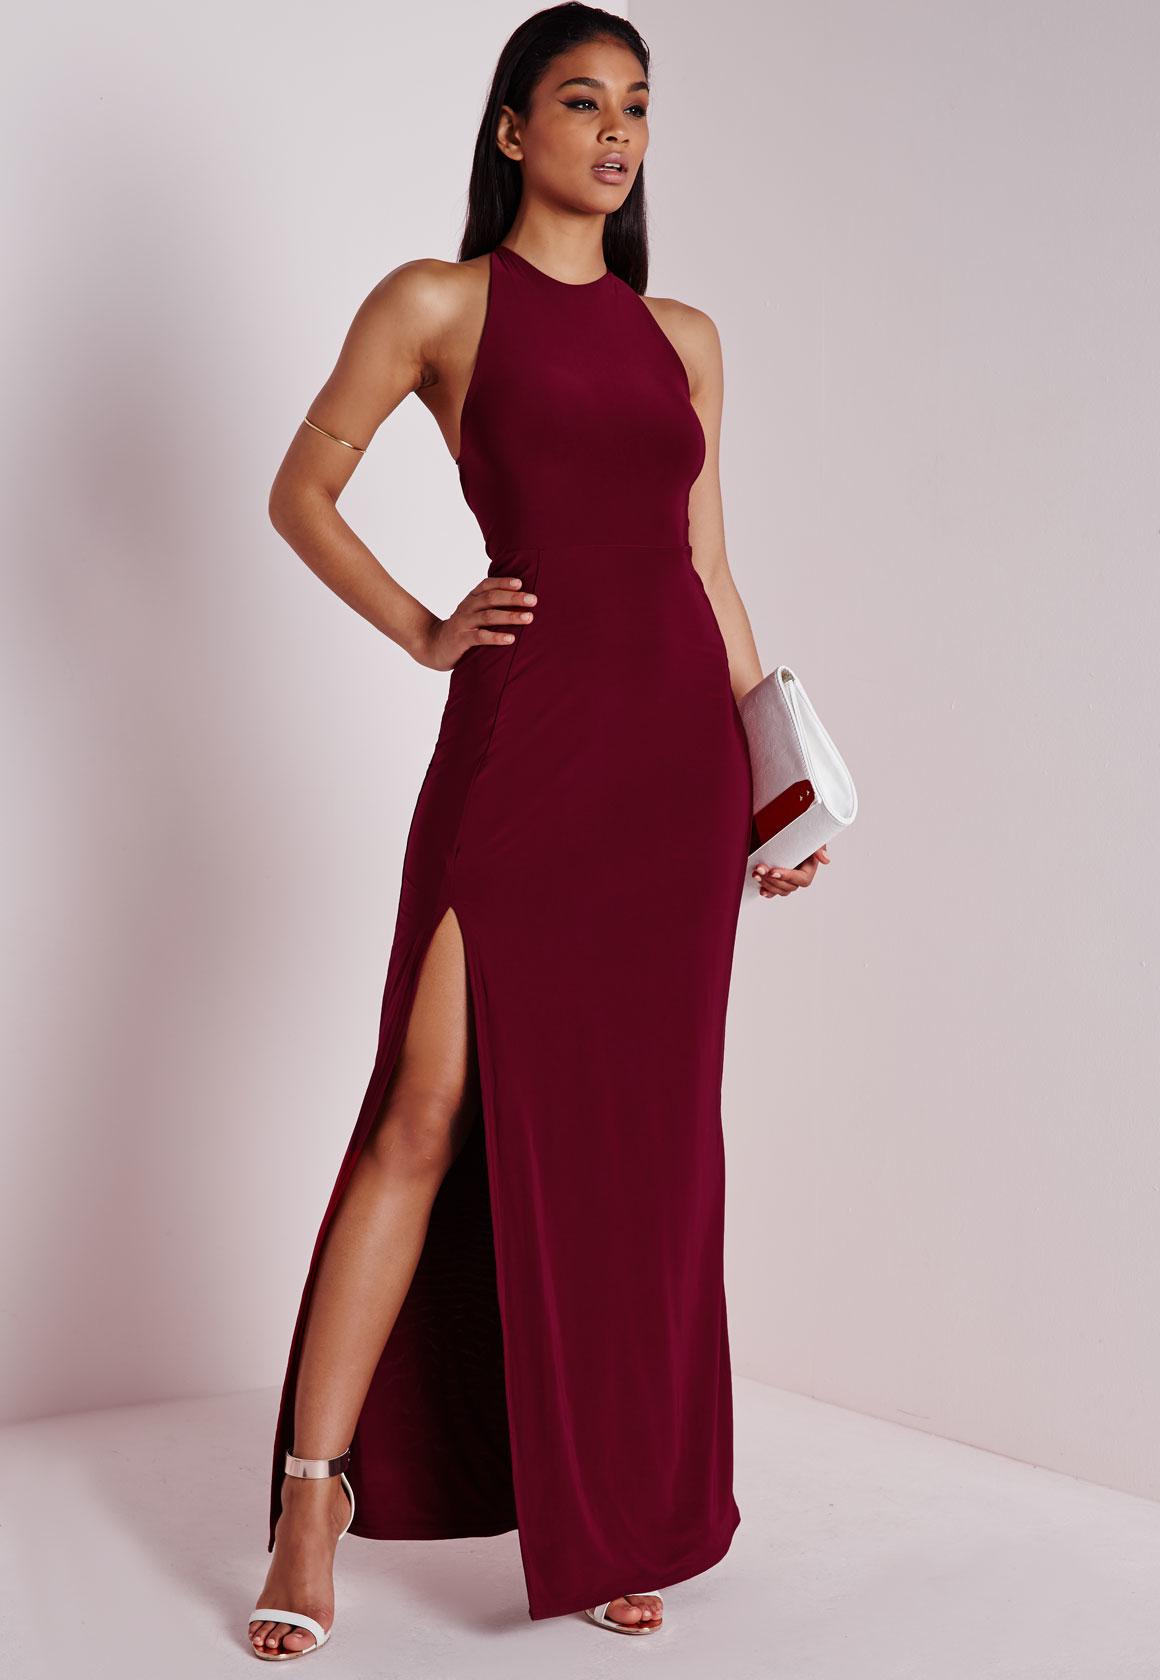 Lovely Burgundy Dress - Lace Dress - Lace Maxi Dress  Maroon Dress